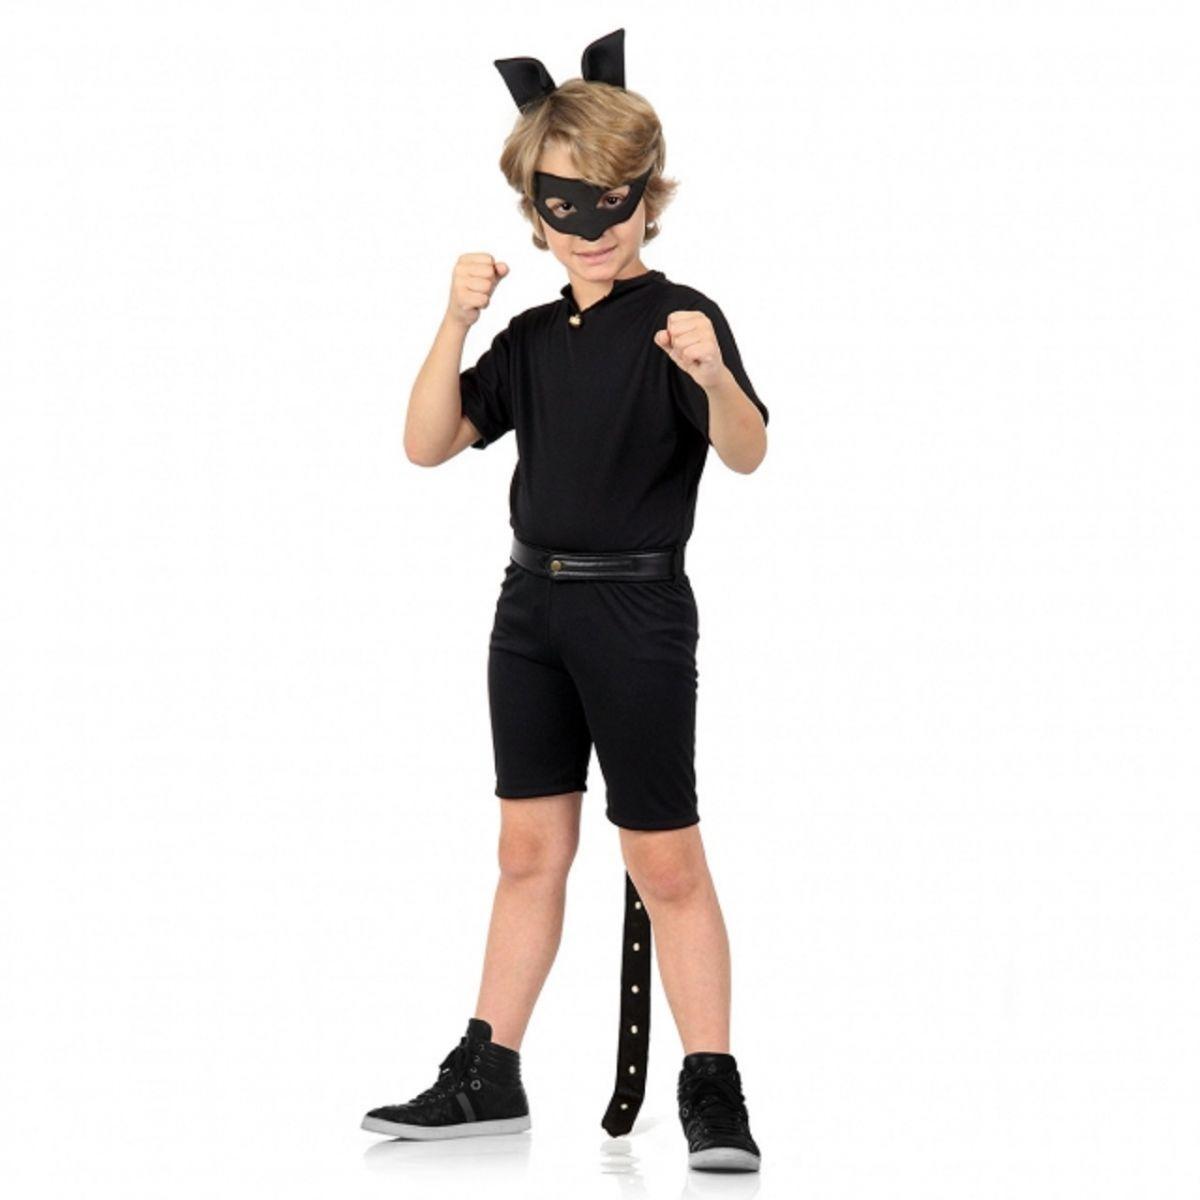 Fantasia Cat Noir Infantil